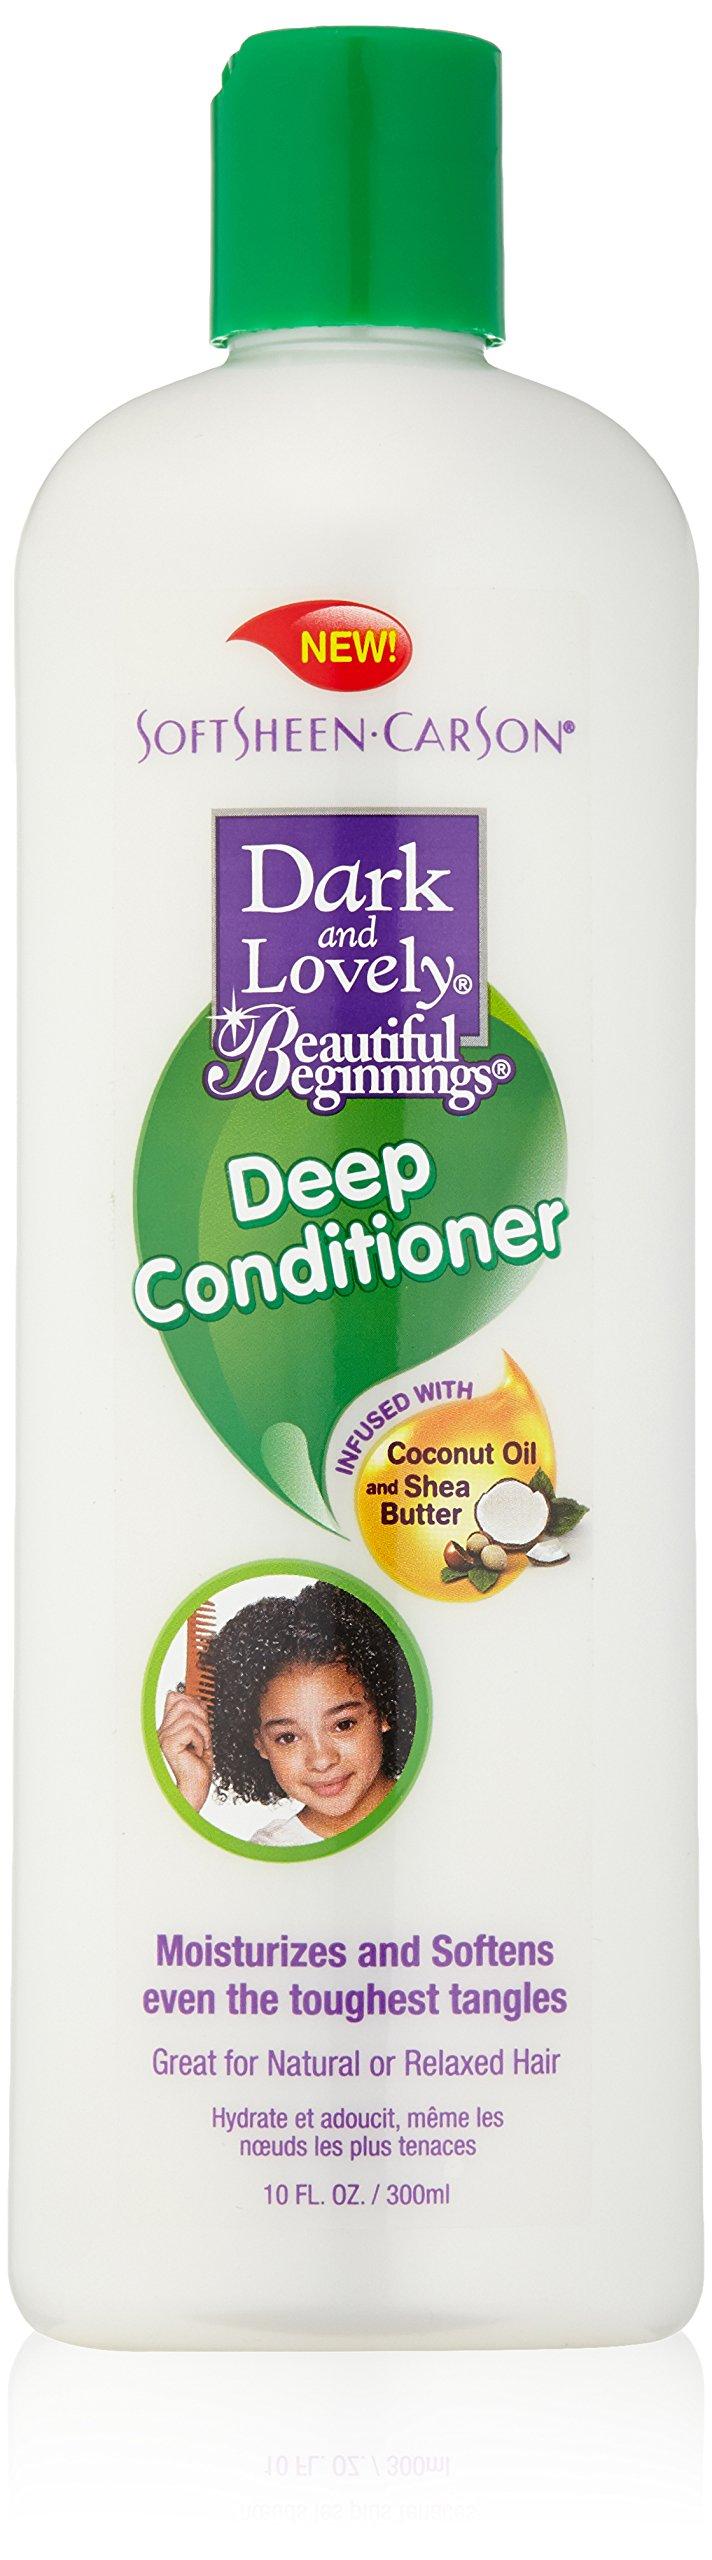 Dark and Lovely Beautiful Beginnings Deep Conditioner, 10 Fluid Ounce